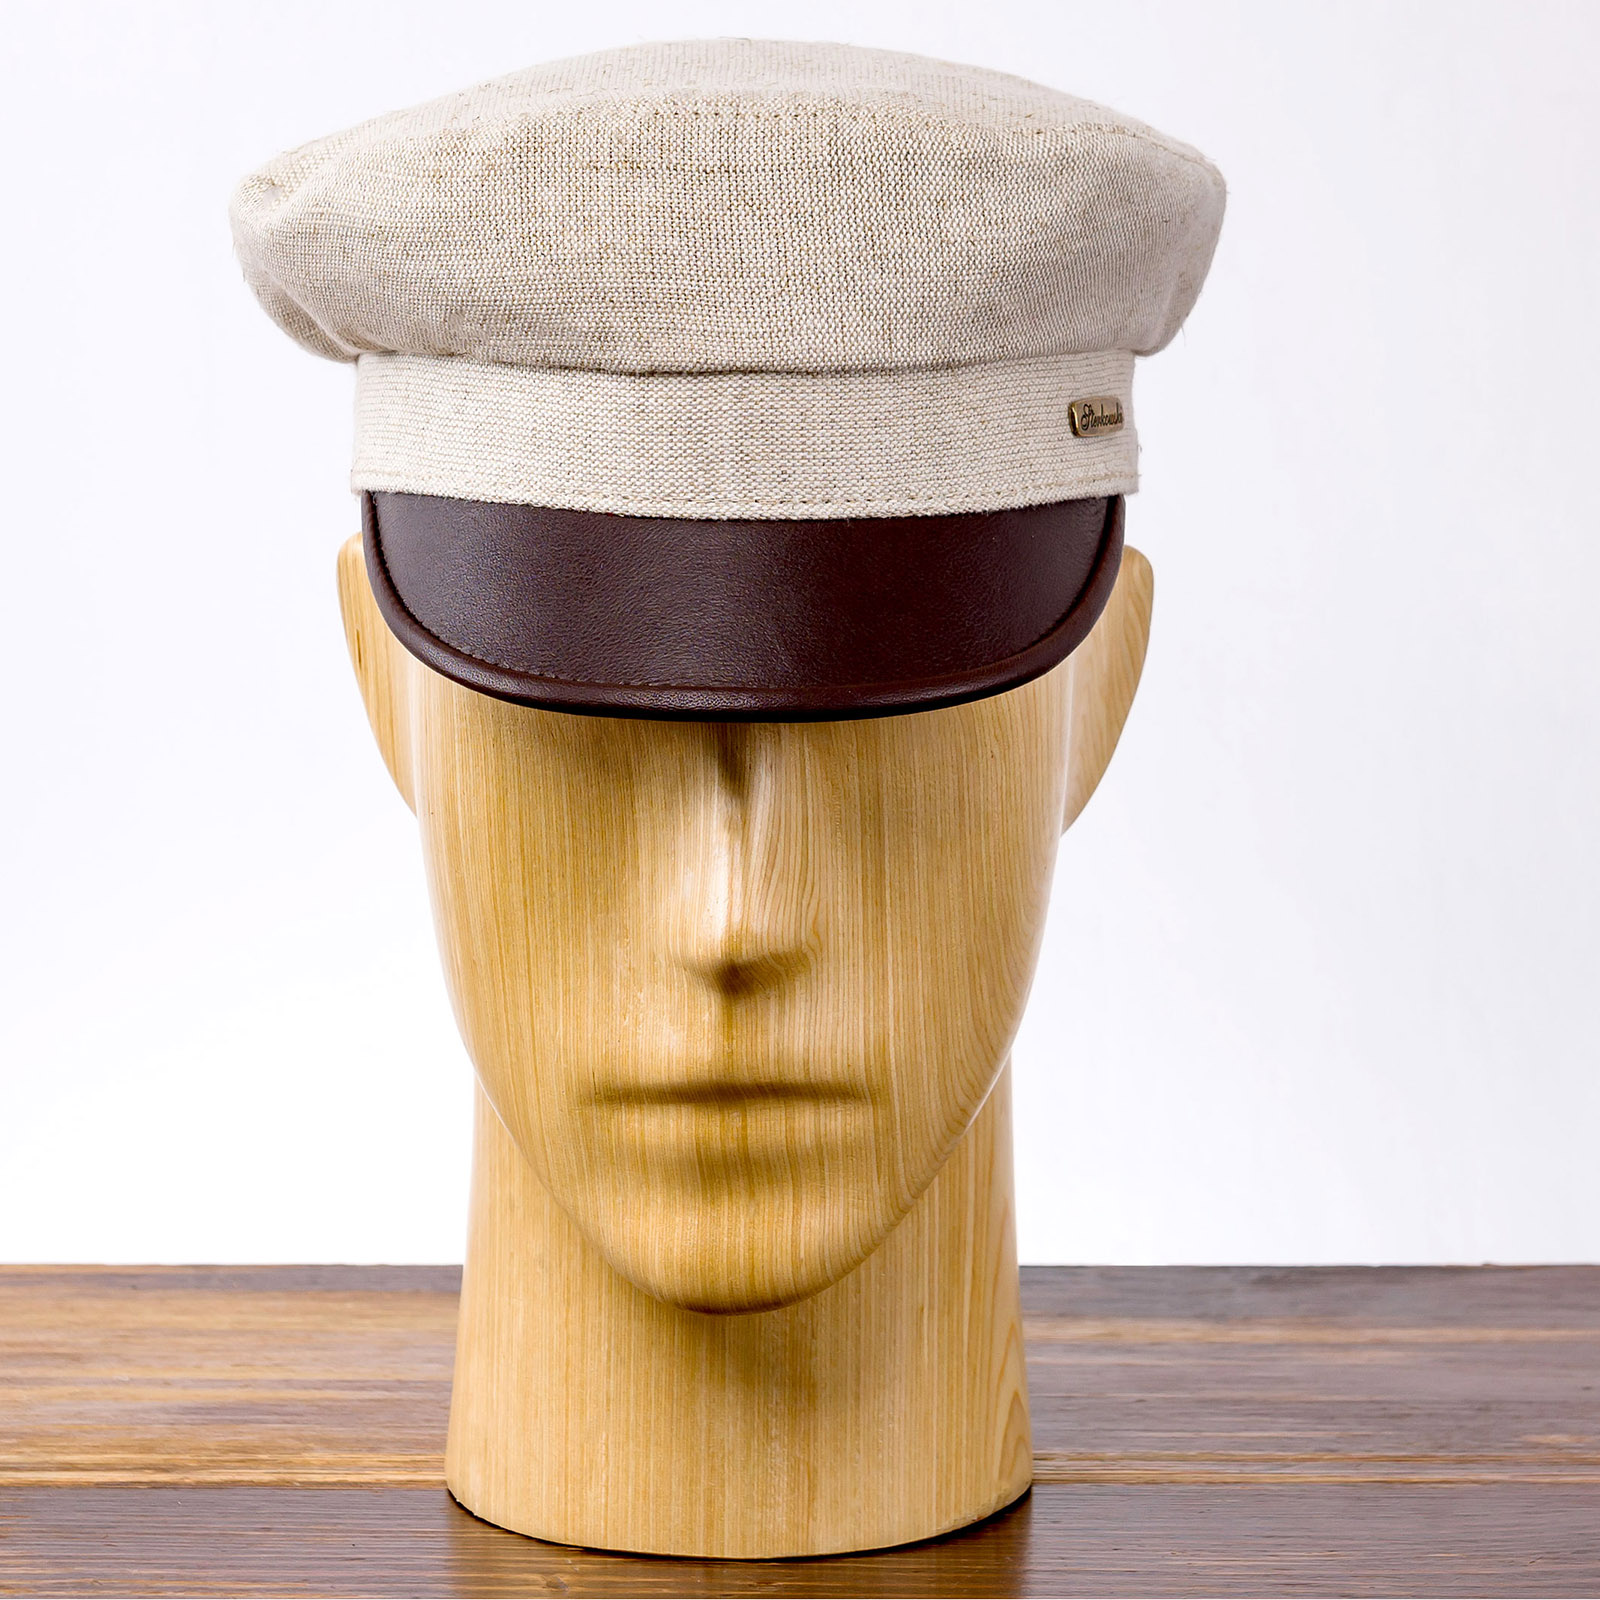 Fiddler linen skin peaked greek fisherman cap airy light sailor boatman mariner barge cab driver milkman jewish tevia camper sun